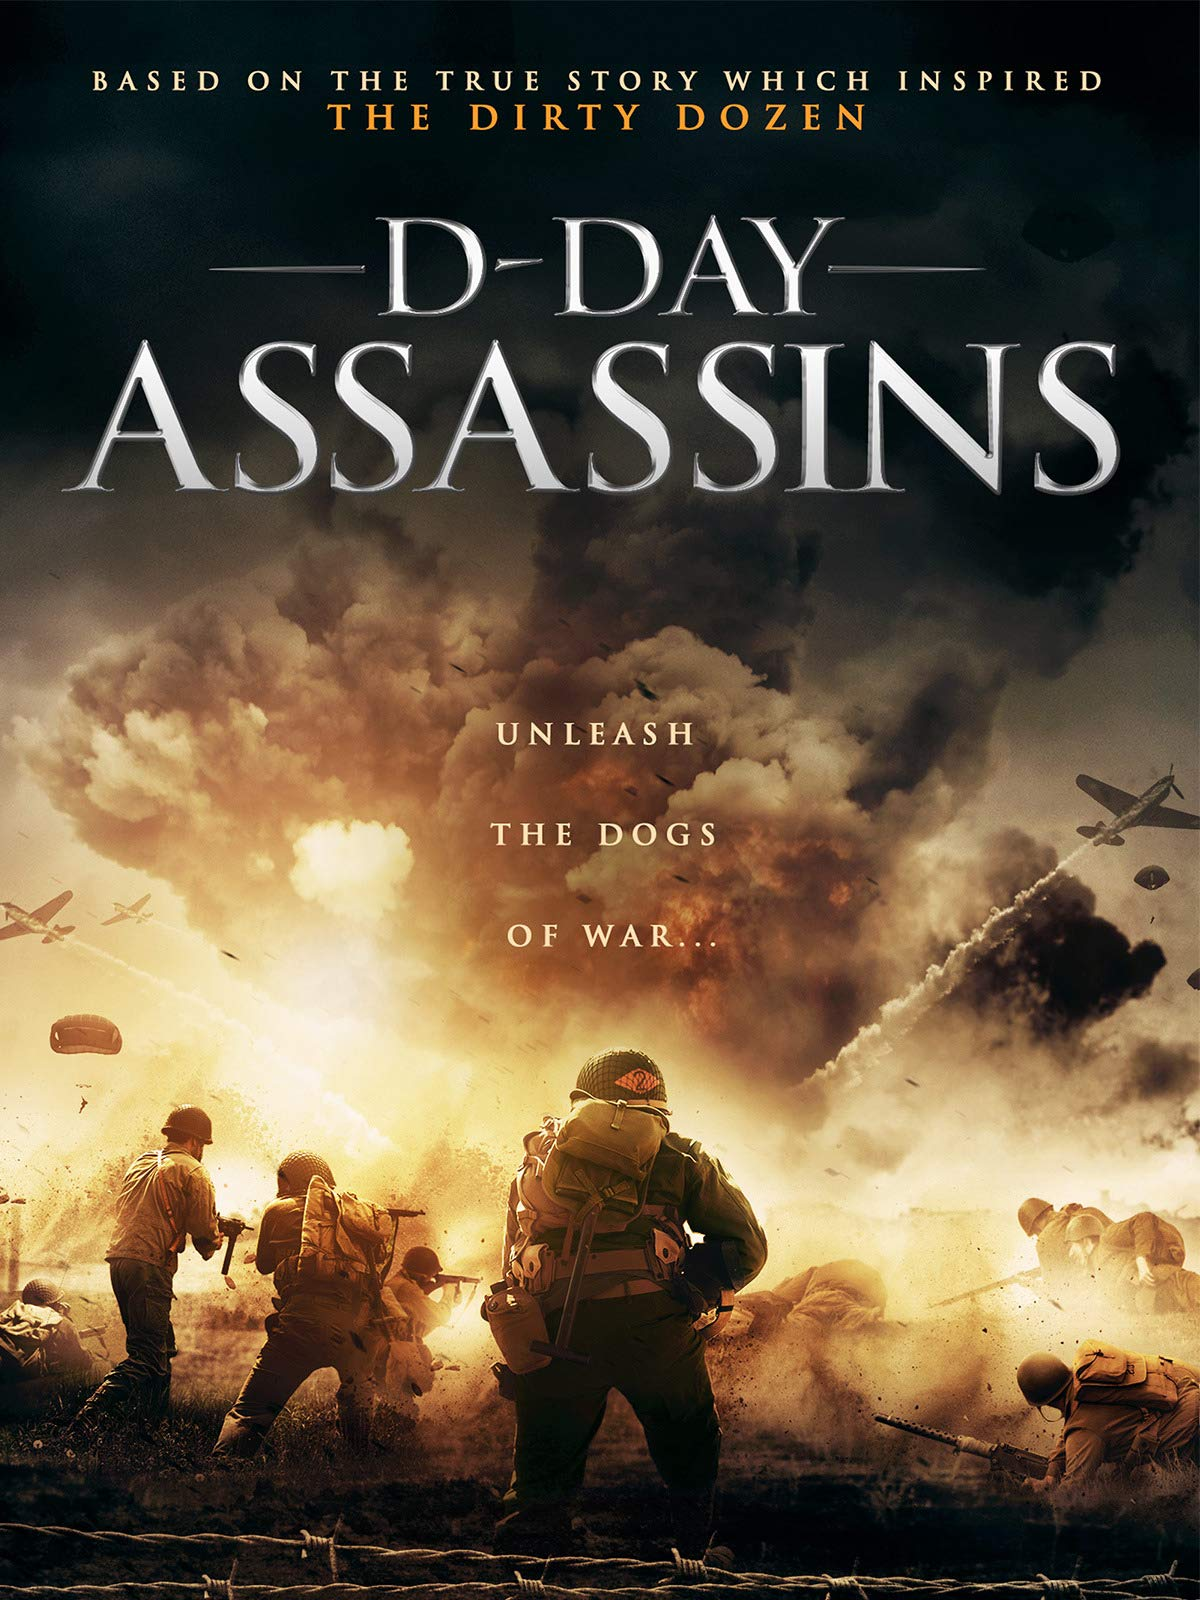 D-Day Assassins (2019) - IMDb